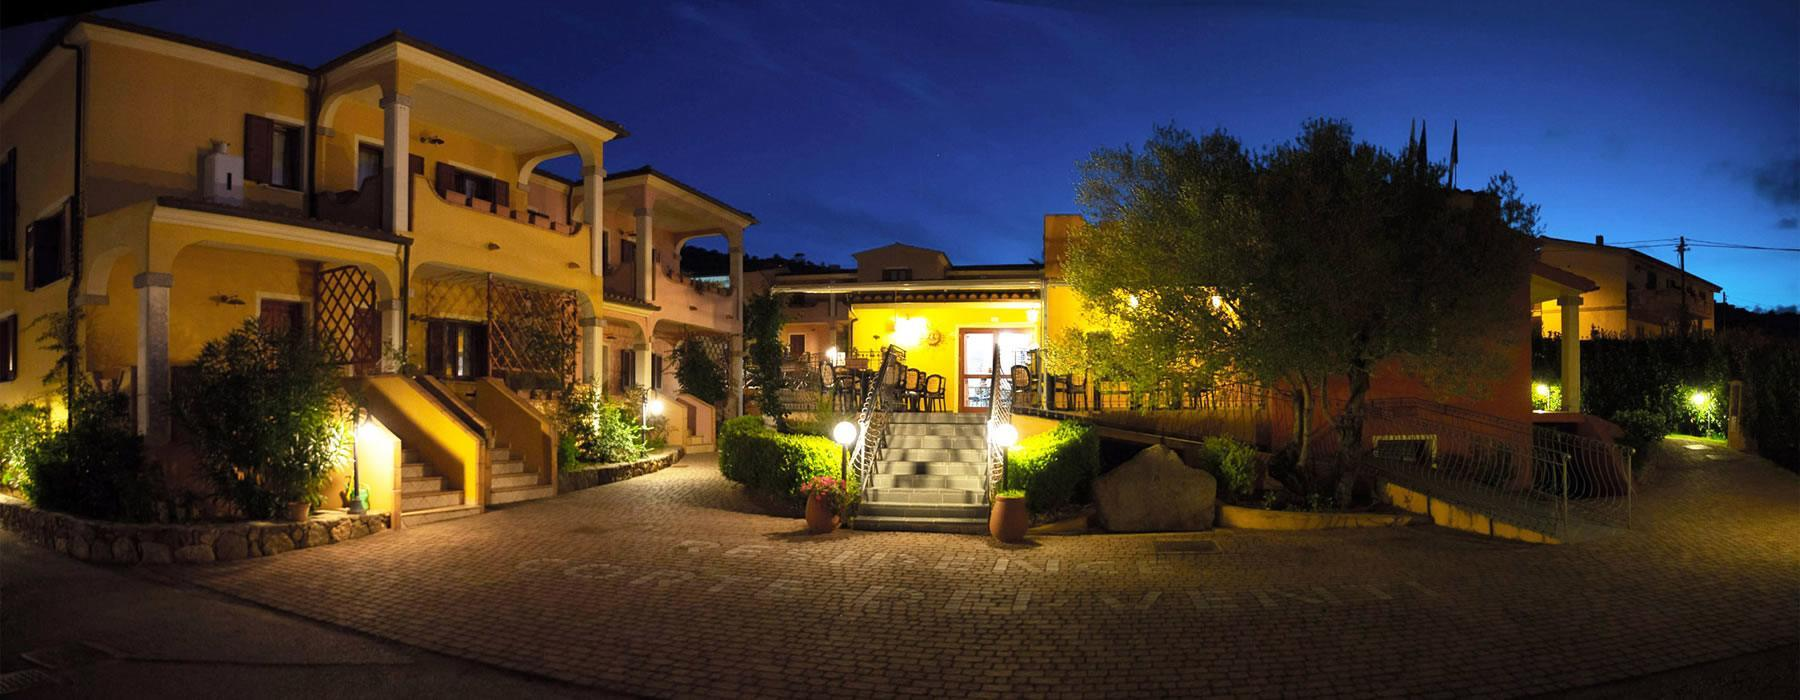 Residence budoni appartamenti sardegna residence corte for Residence budoni